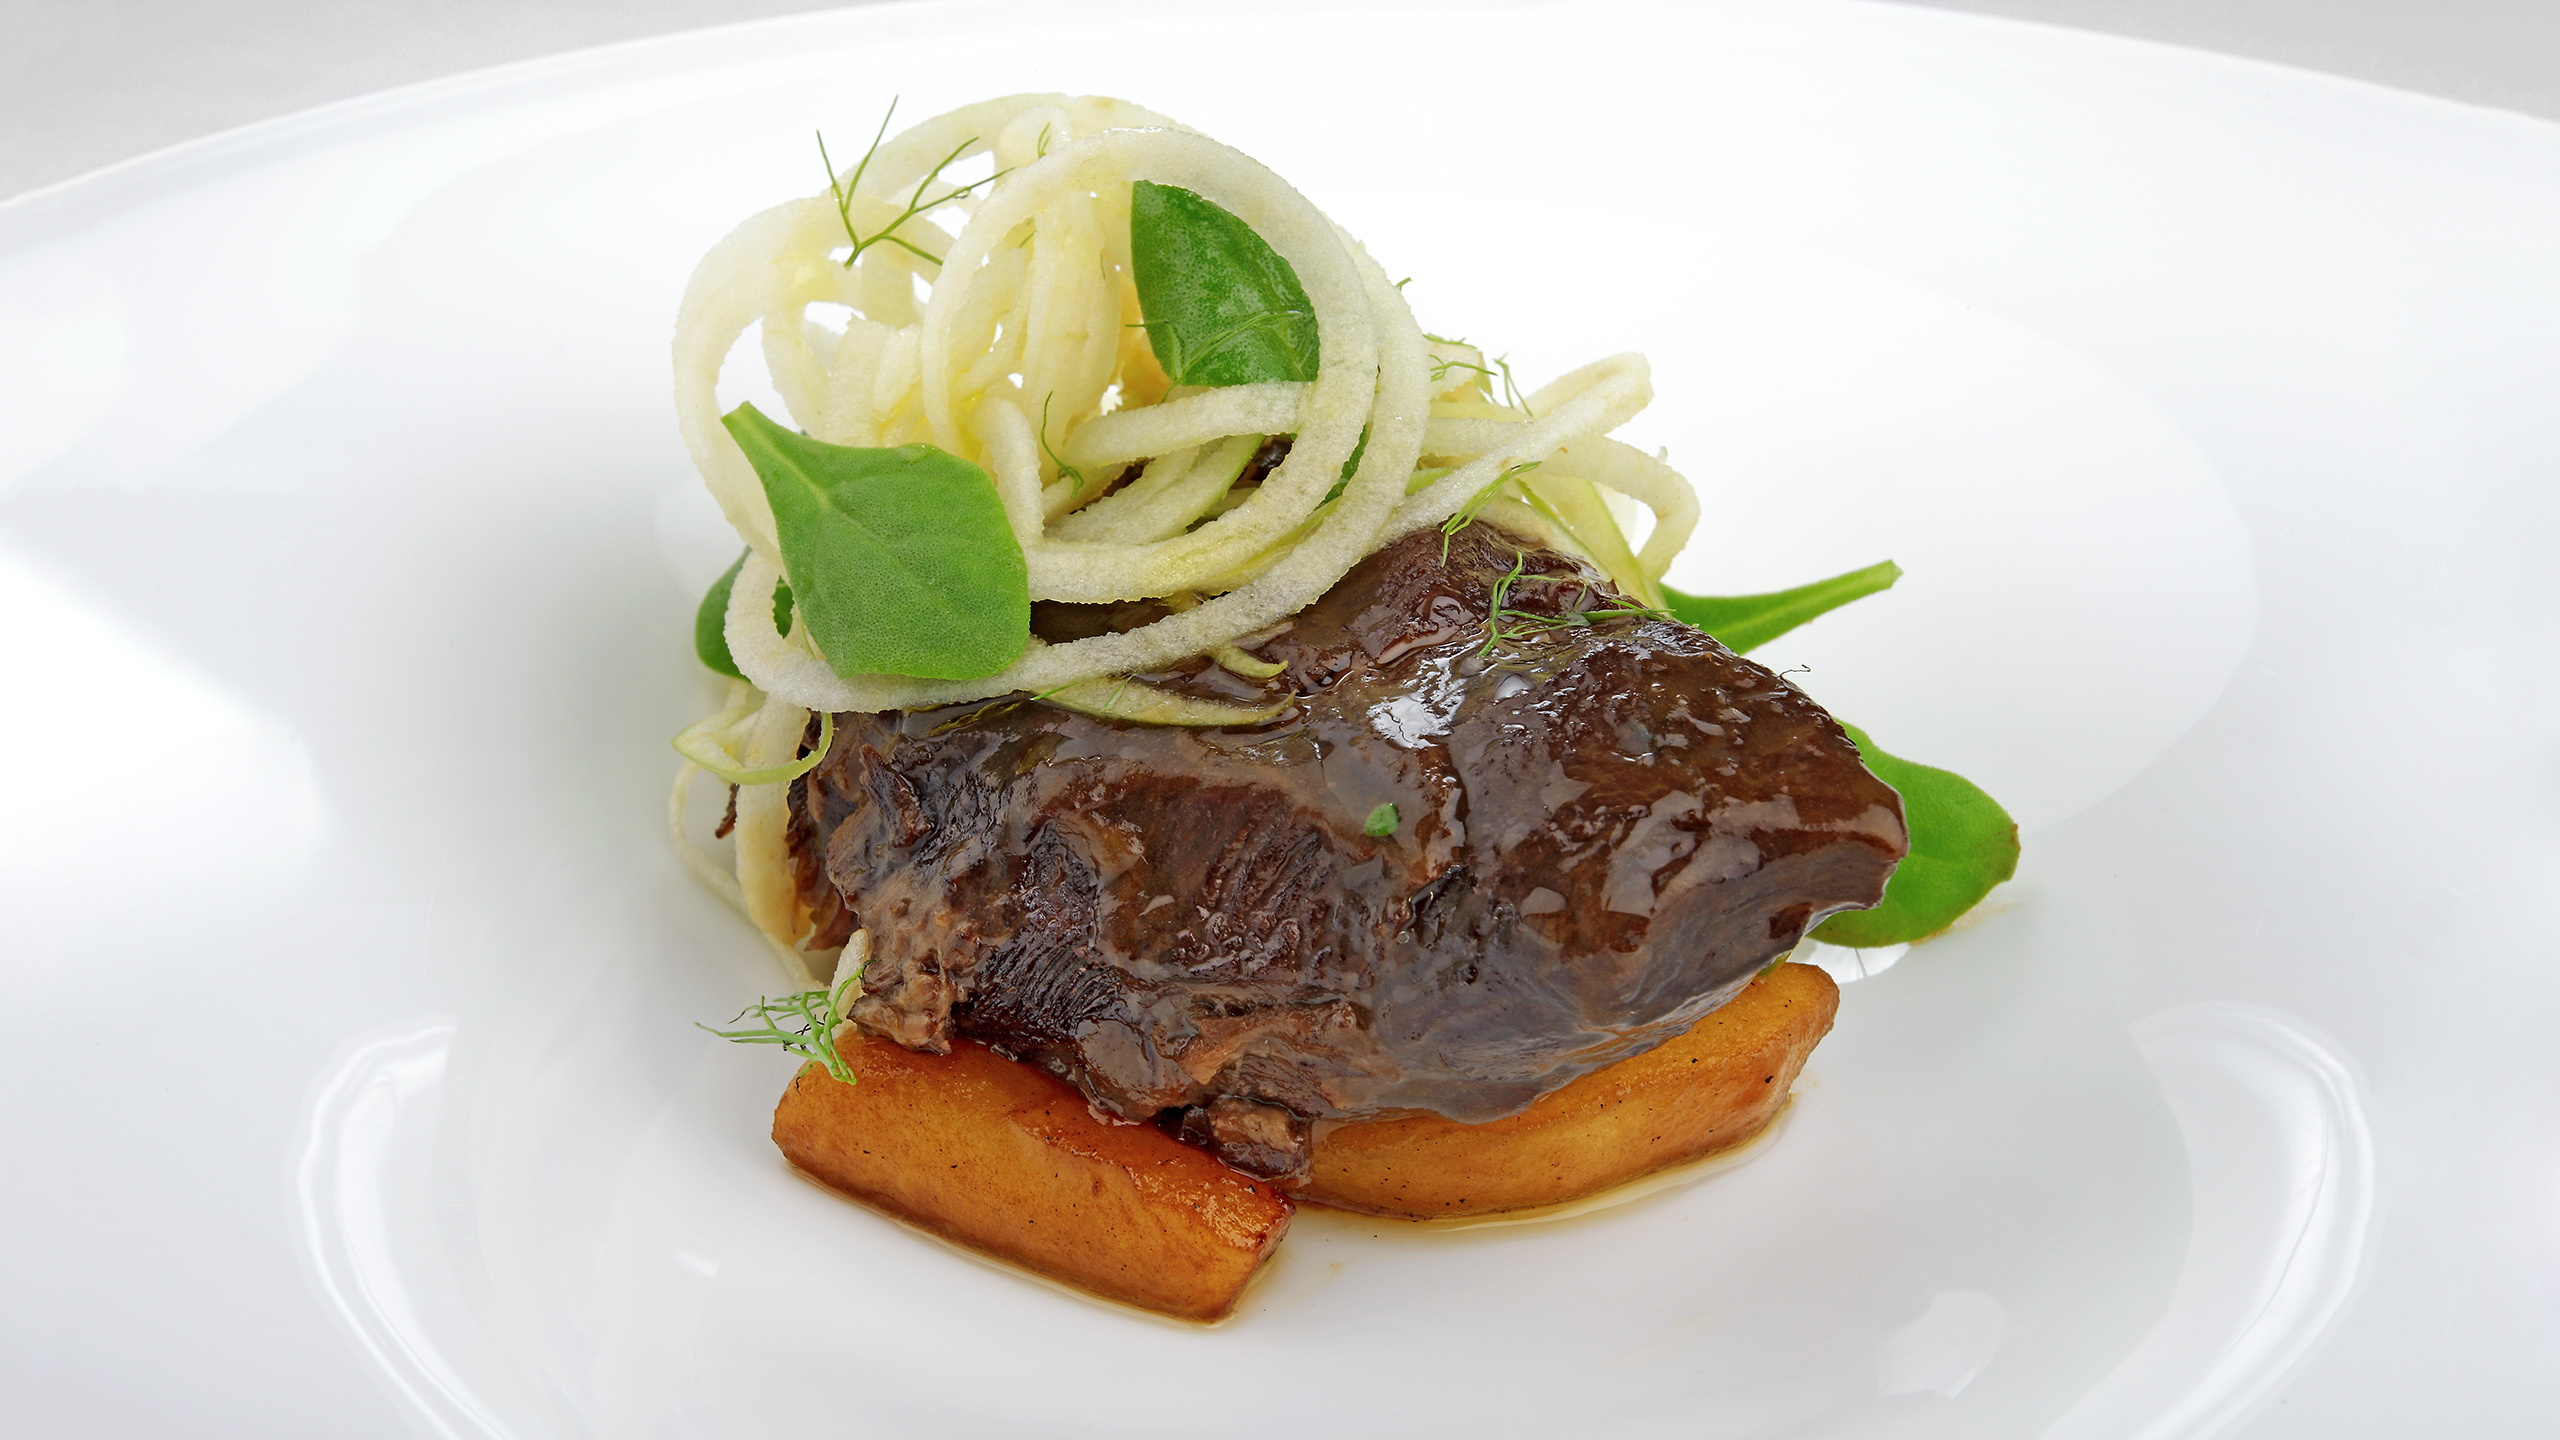 gastronomia 62 tafona